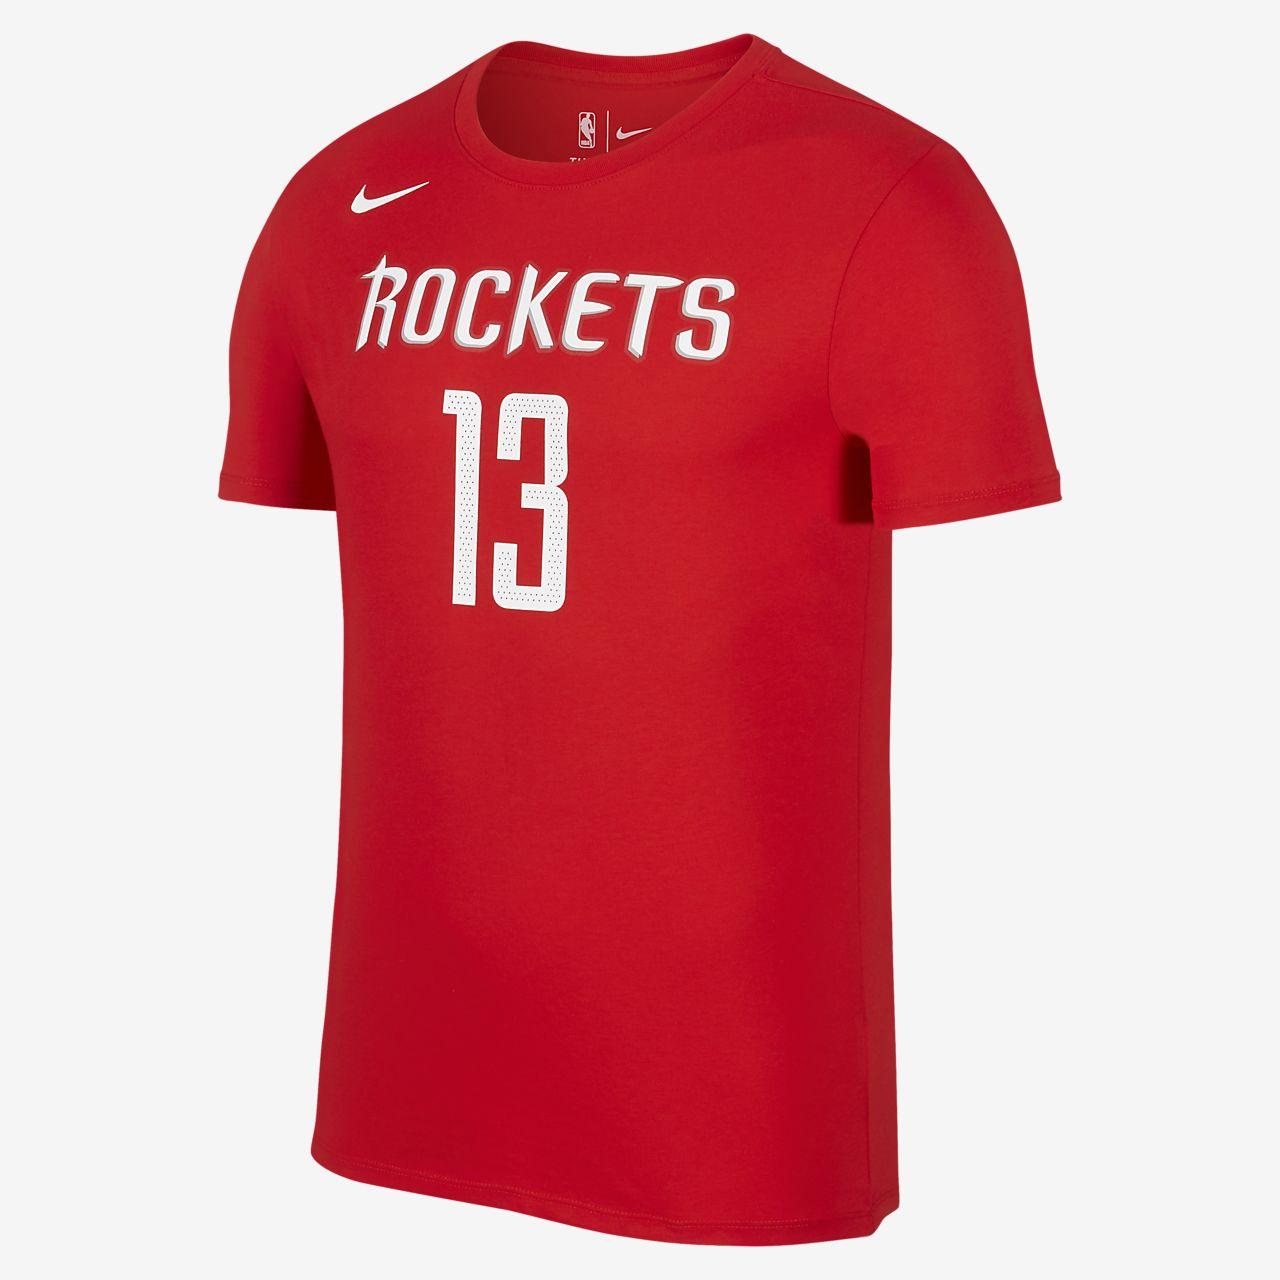 8419b178dee James Harden Houston Rockets Nike Dri-FIT Men s NBA T-Shirt. Nike.com